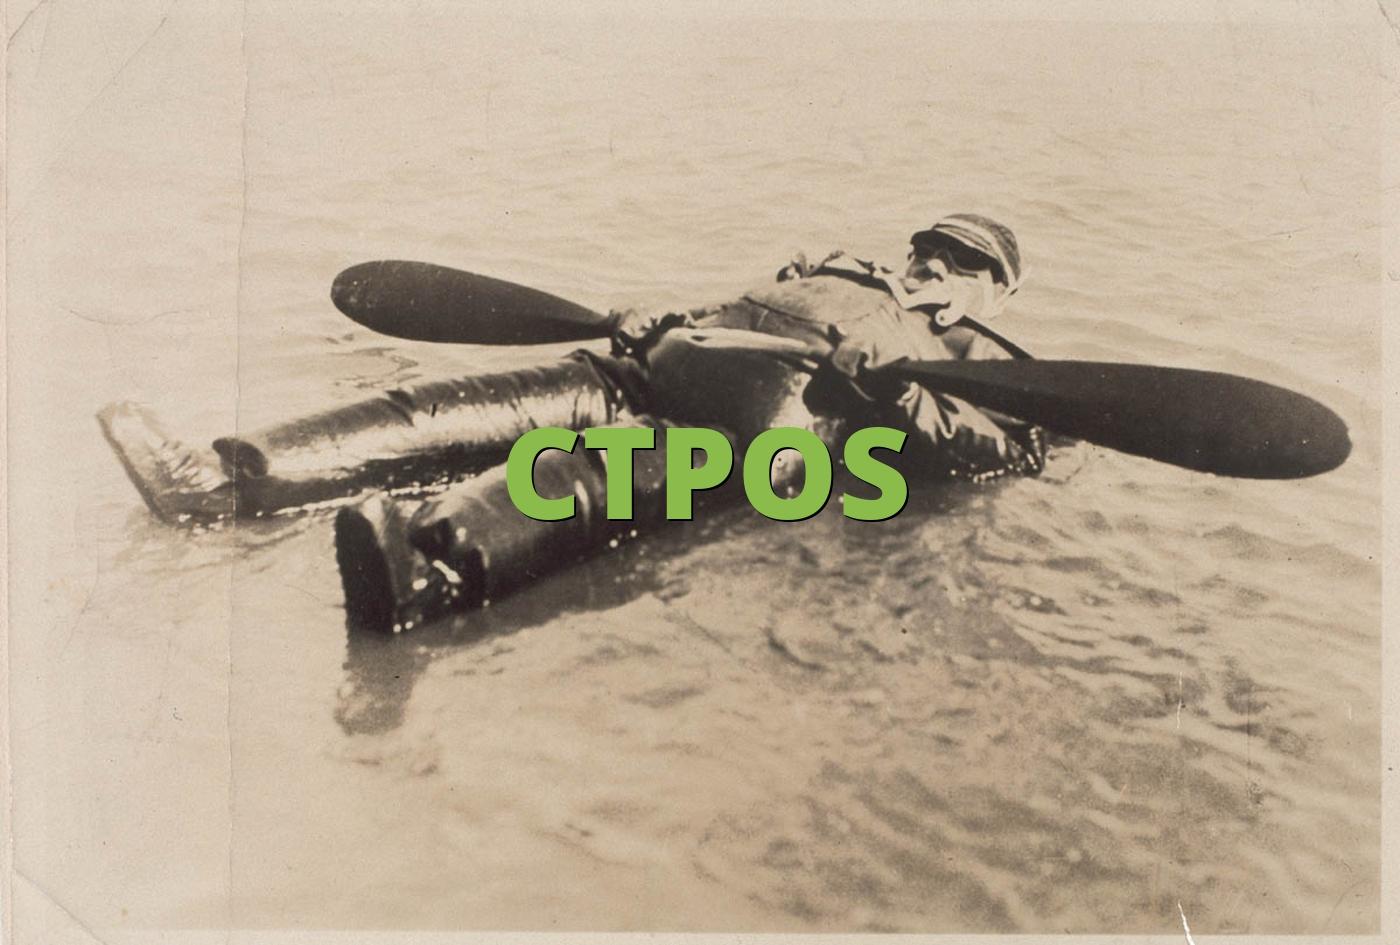 CTPOS